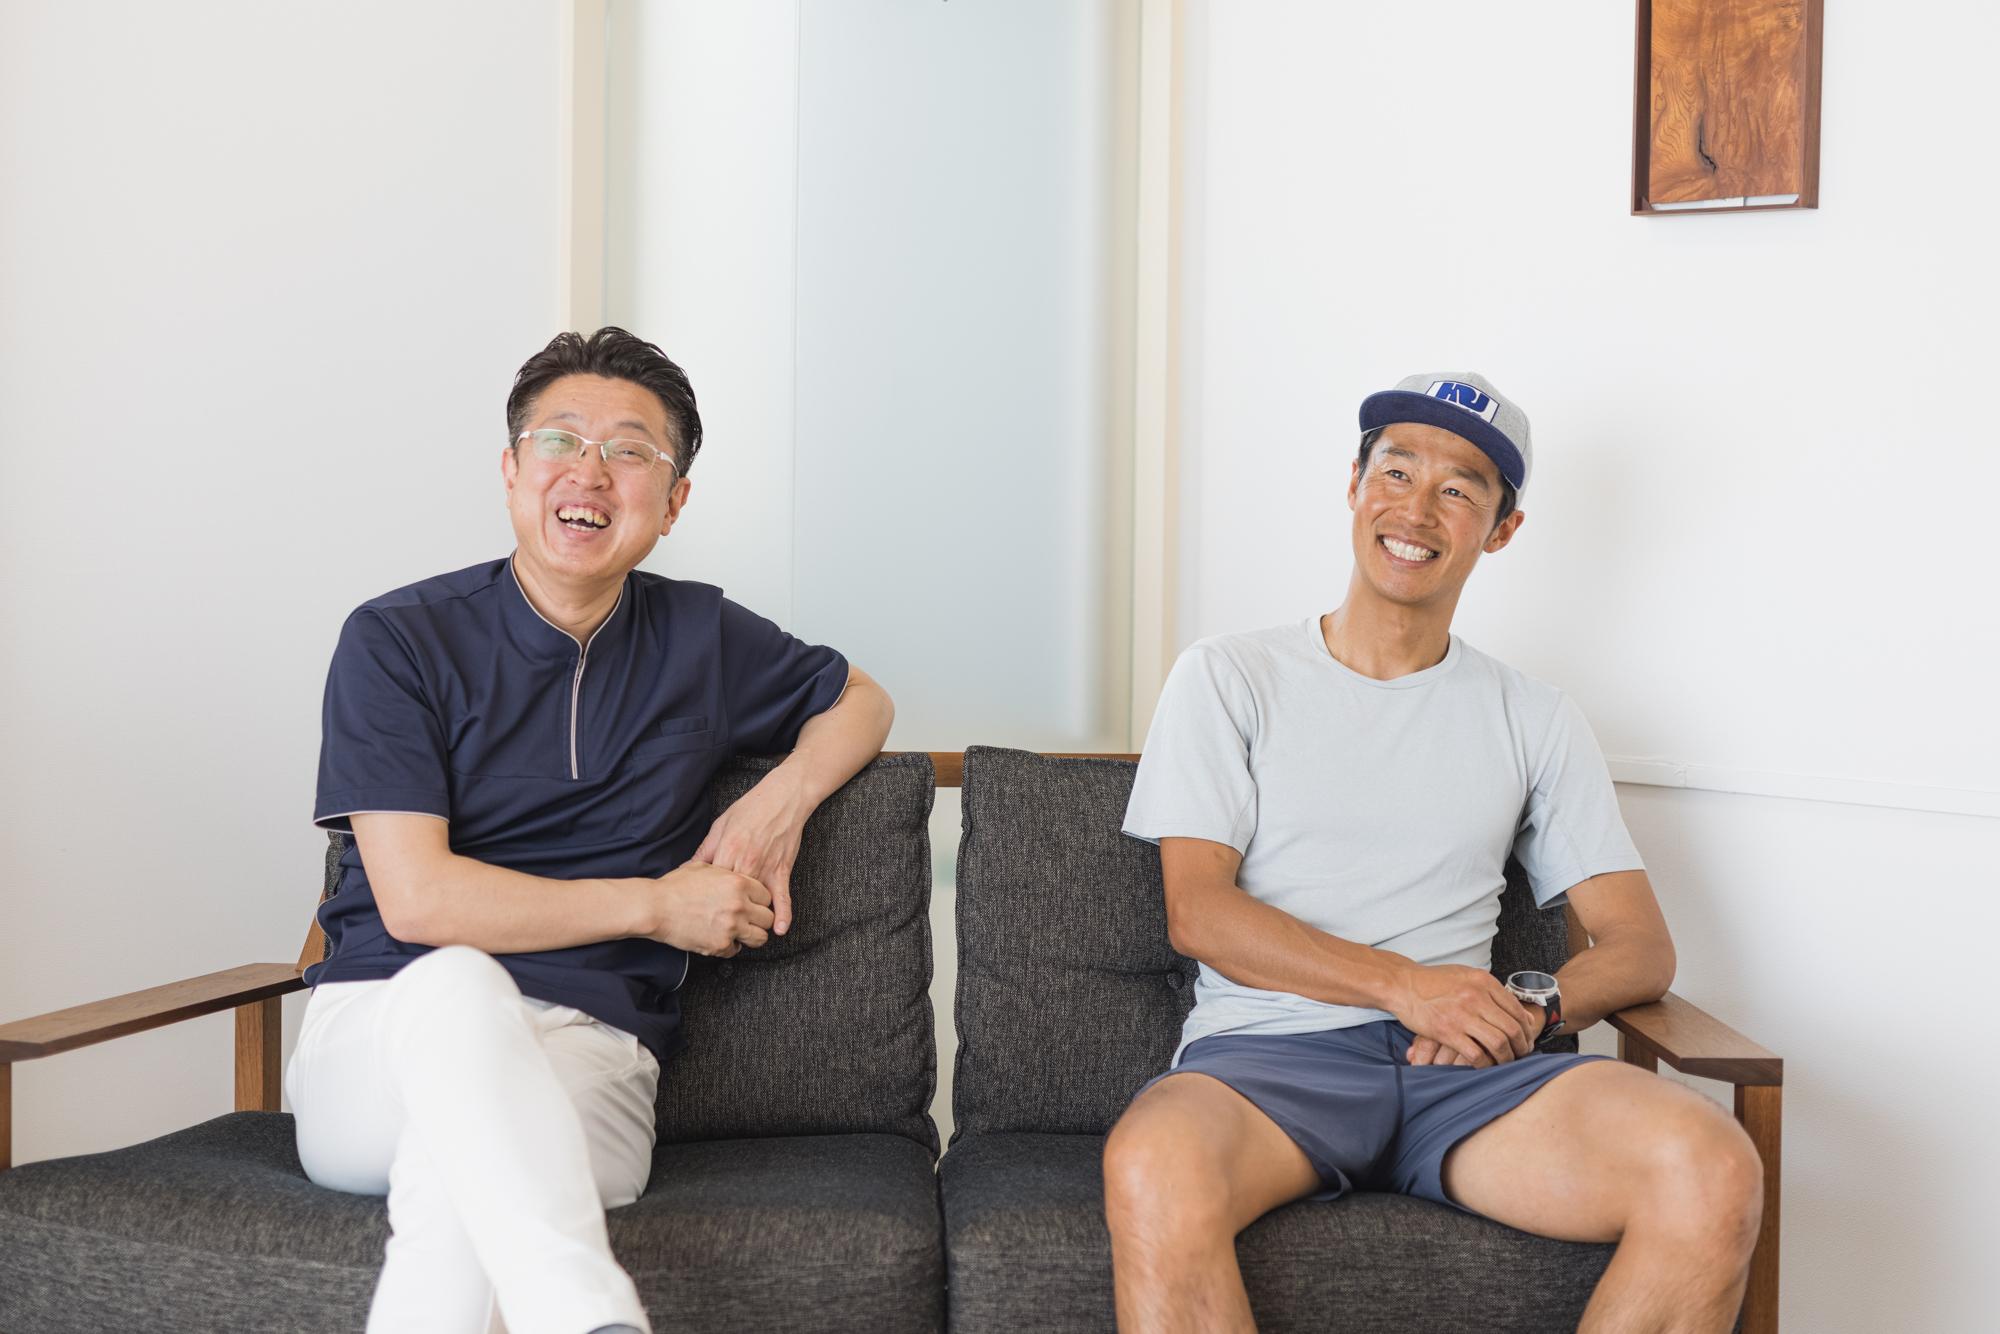 Kenichi-Yamamoto_&_Yamagishi_chatting_photo